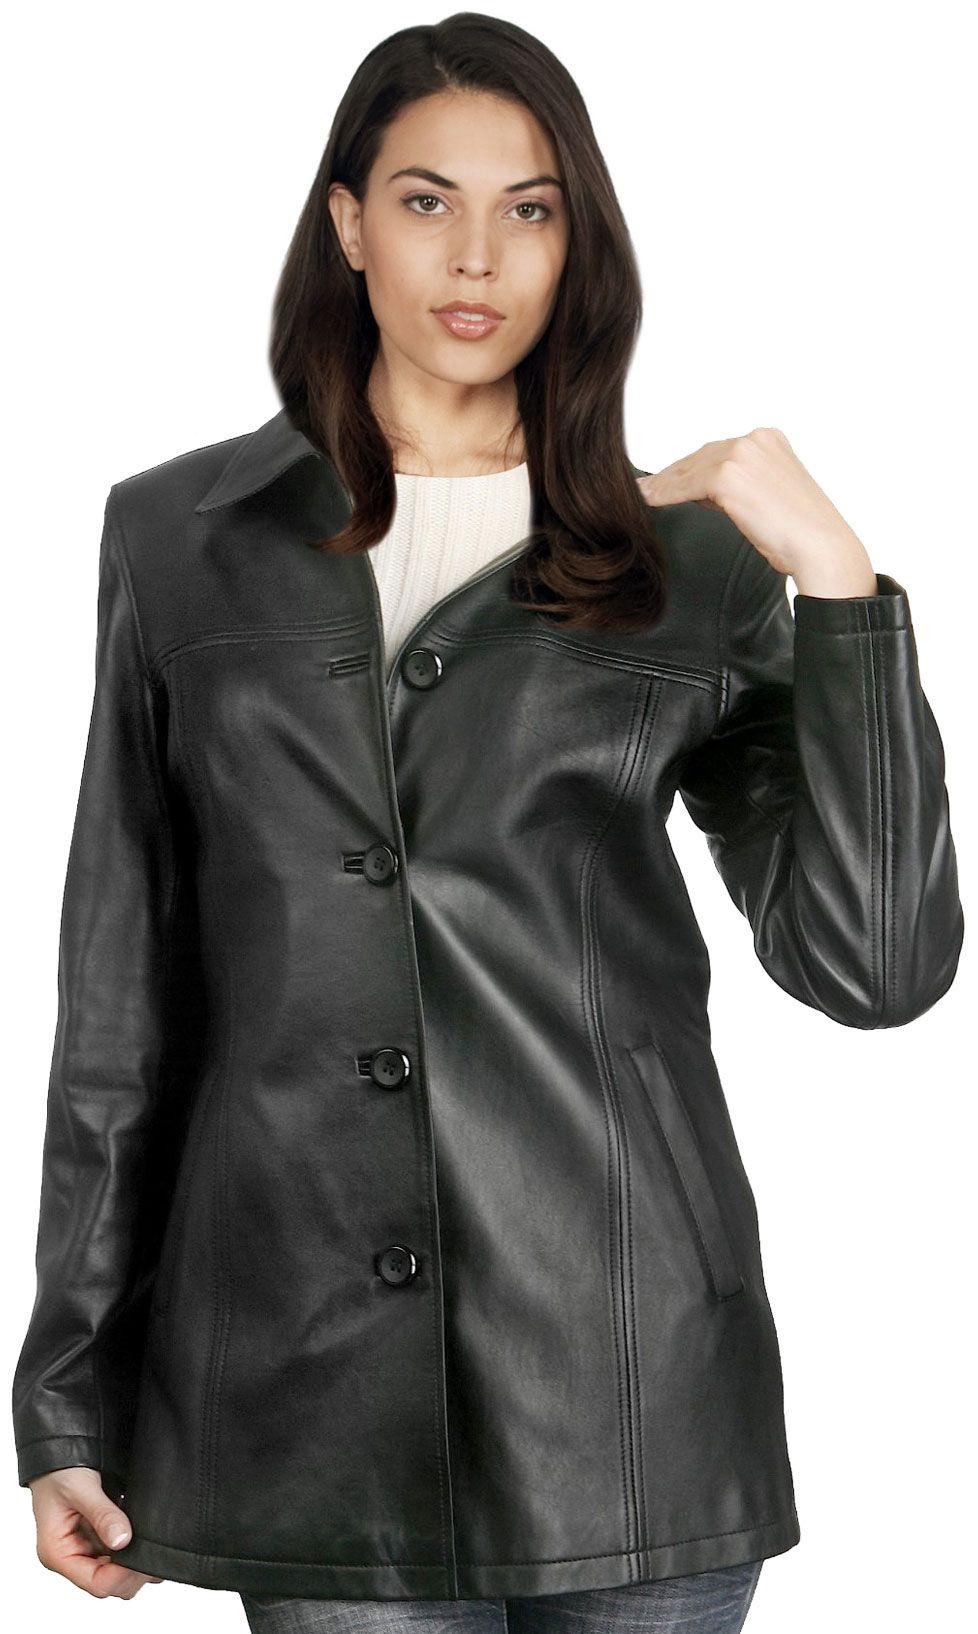 Buy soft lambskin womens leather coats online | Coats | Pinterest ...